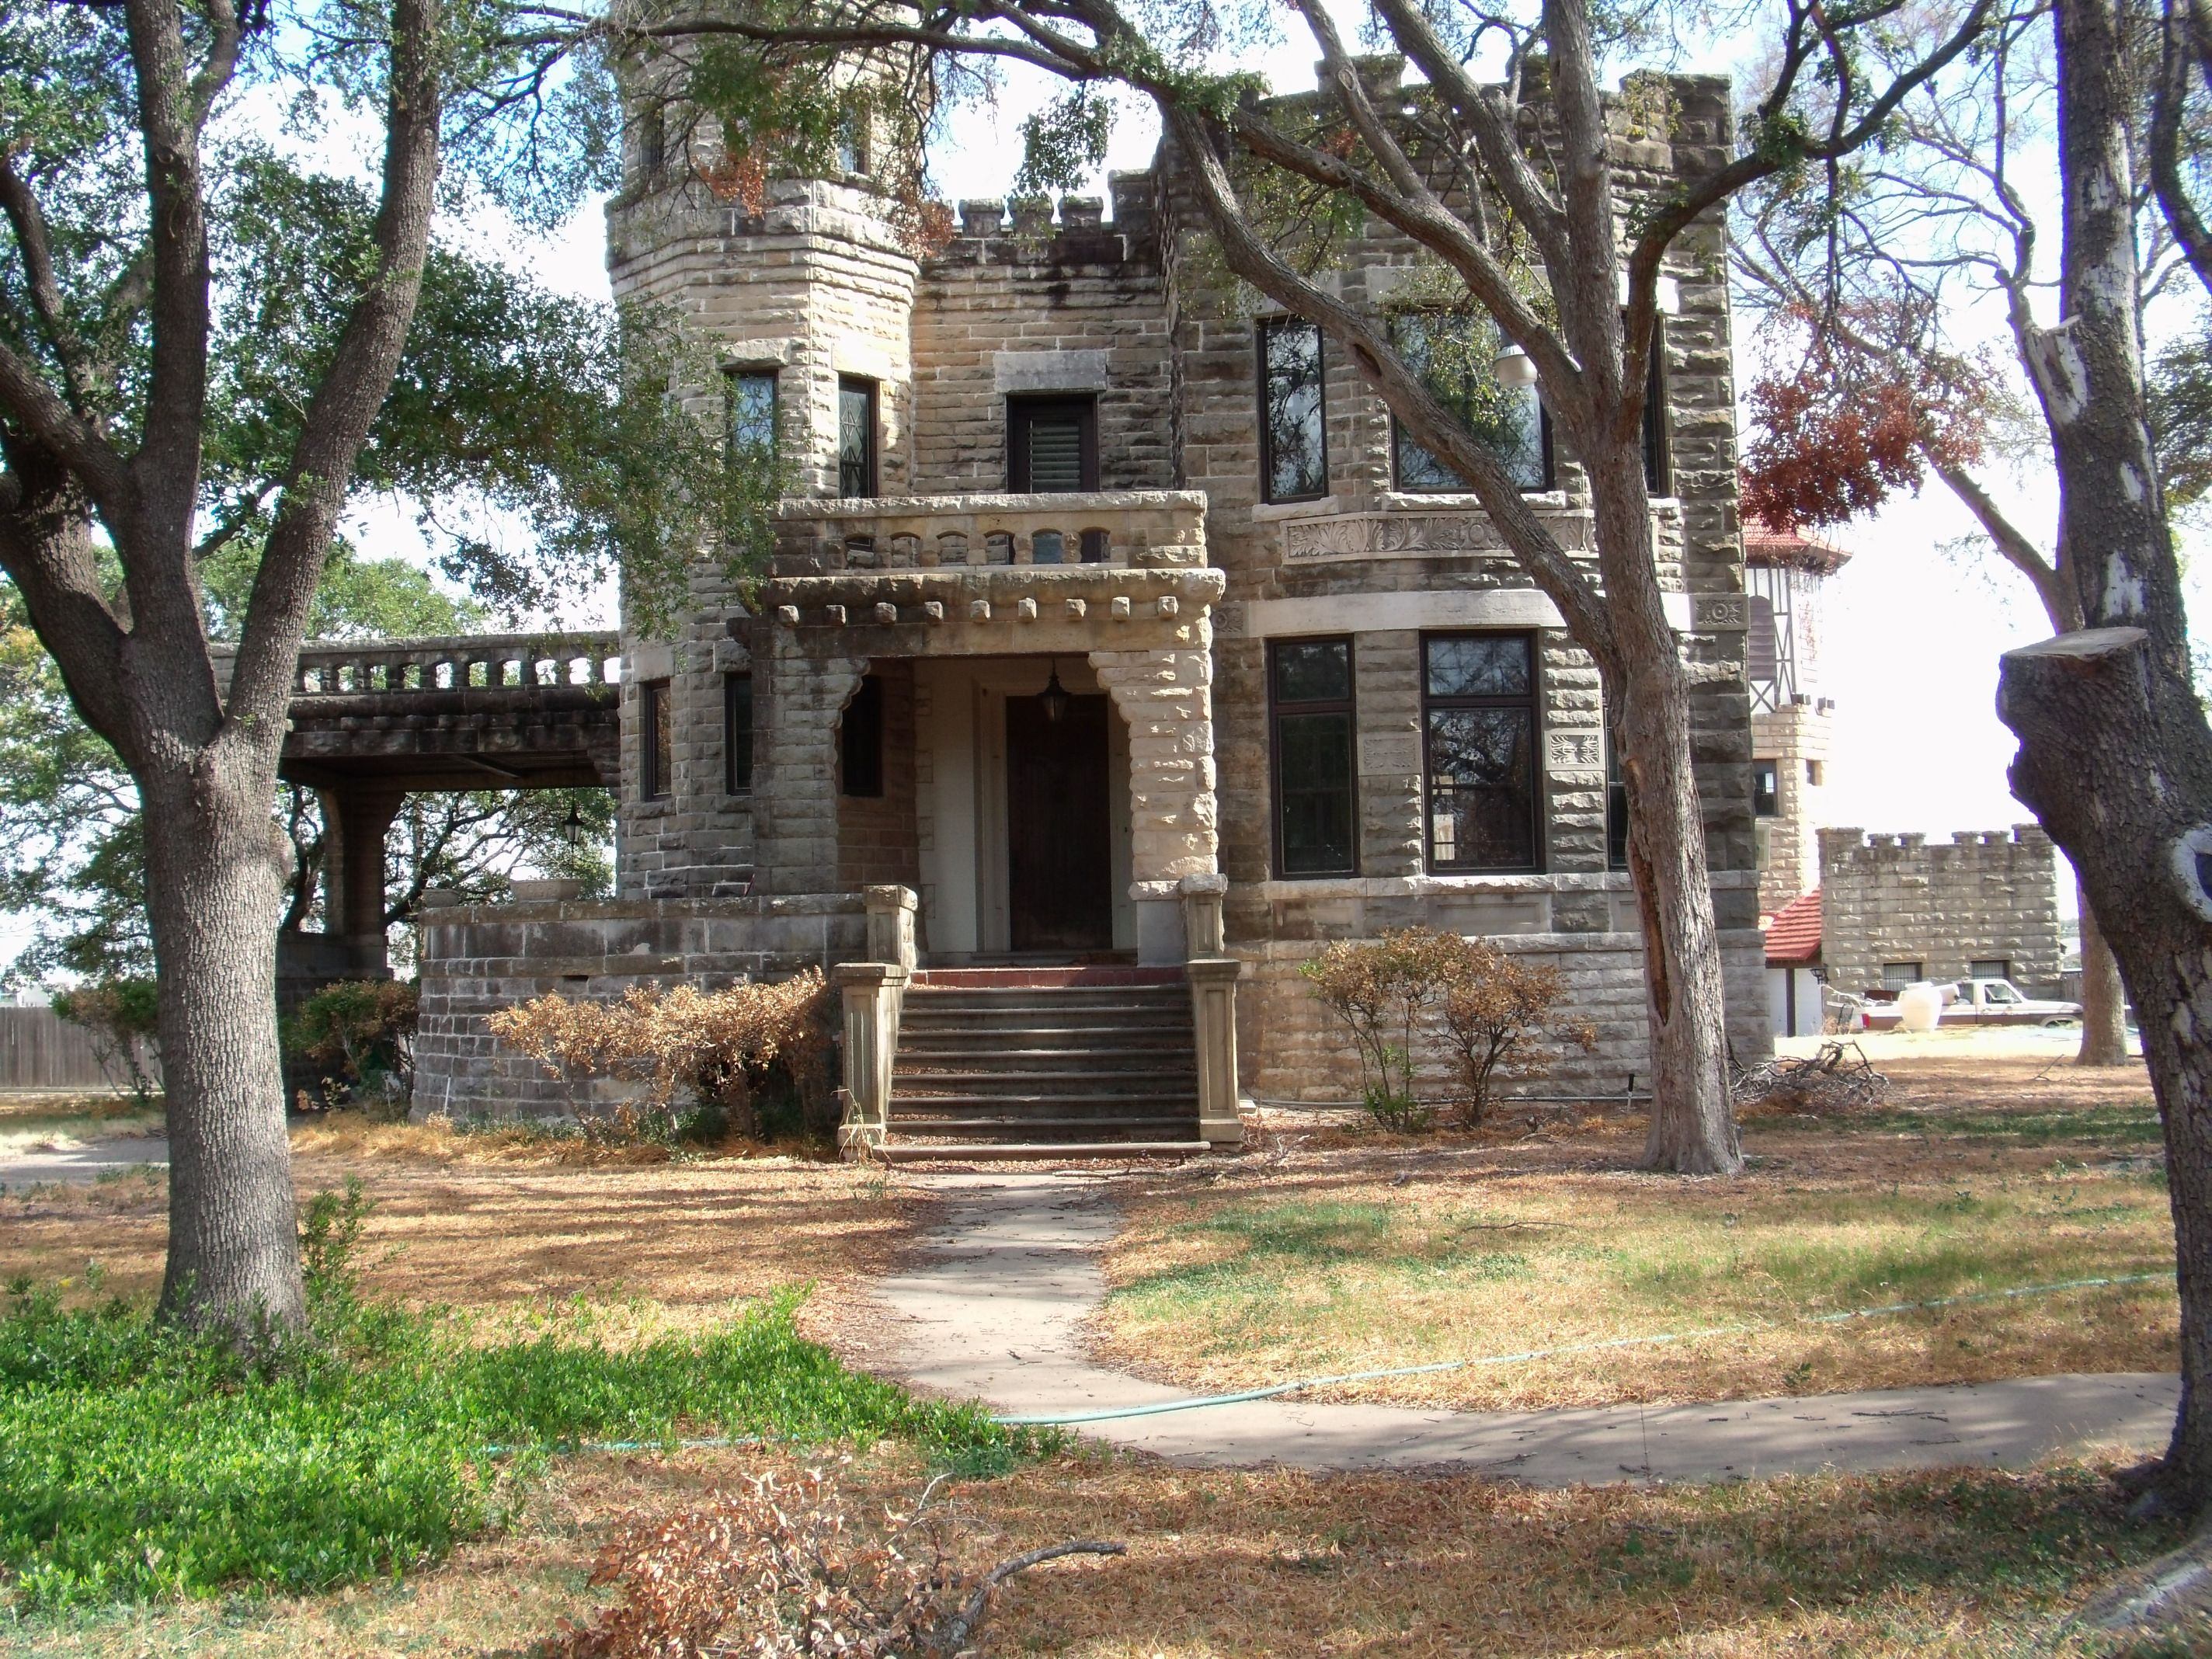 Real Castles In Texas Waco Tx Real Estate John Derrick